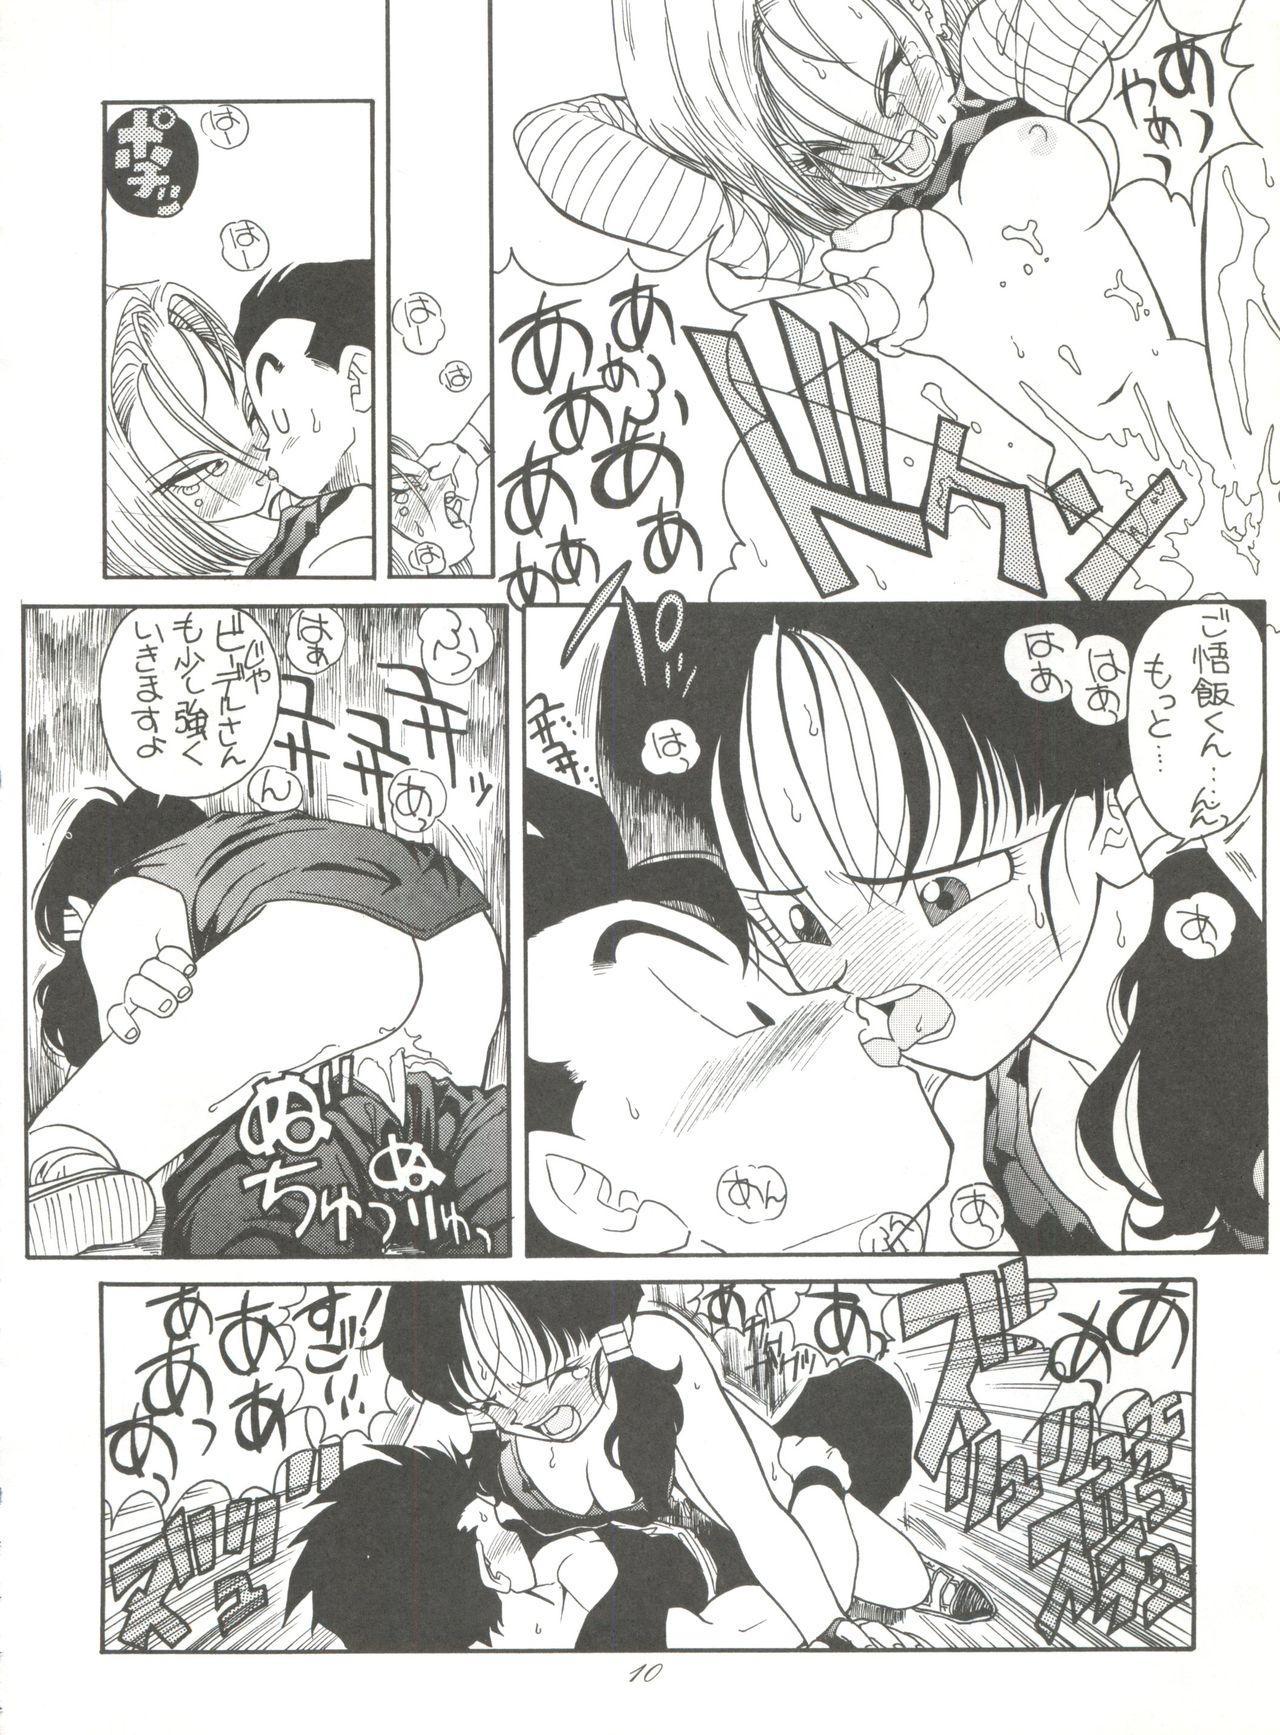 Hara Hara Dokei Vol. 4 Quattro 8